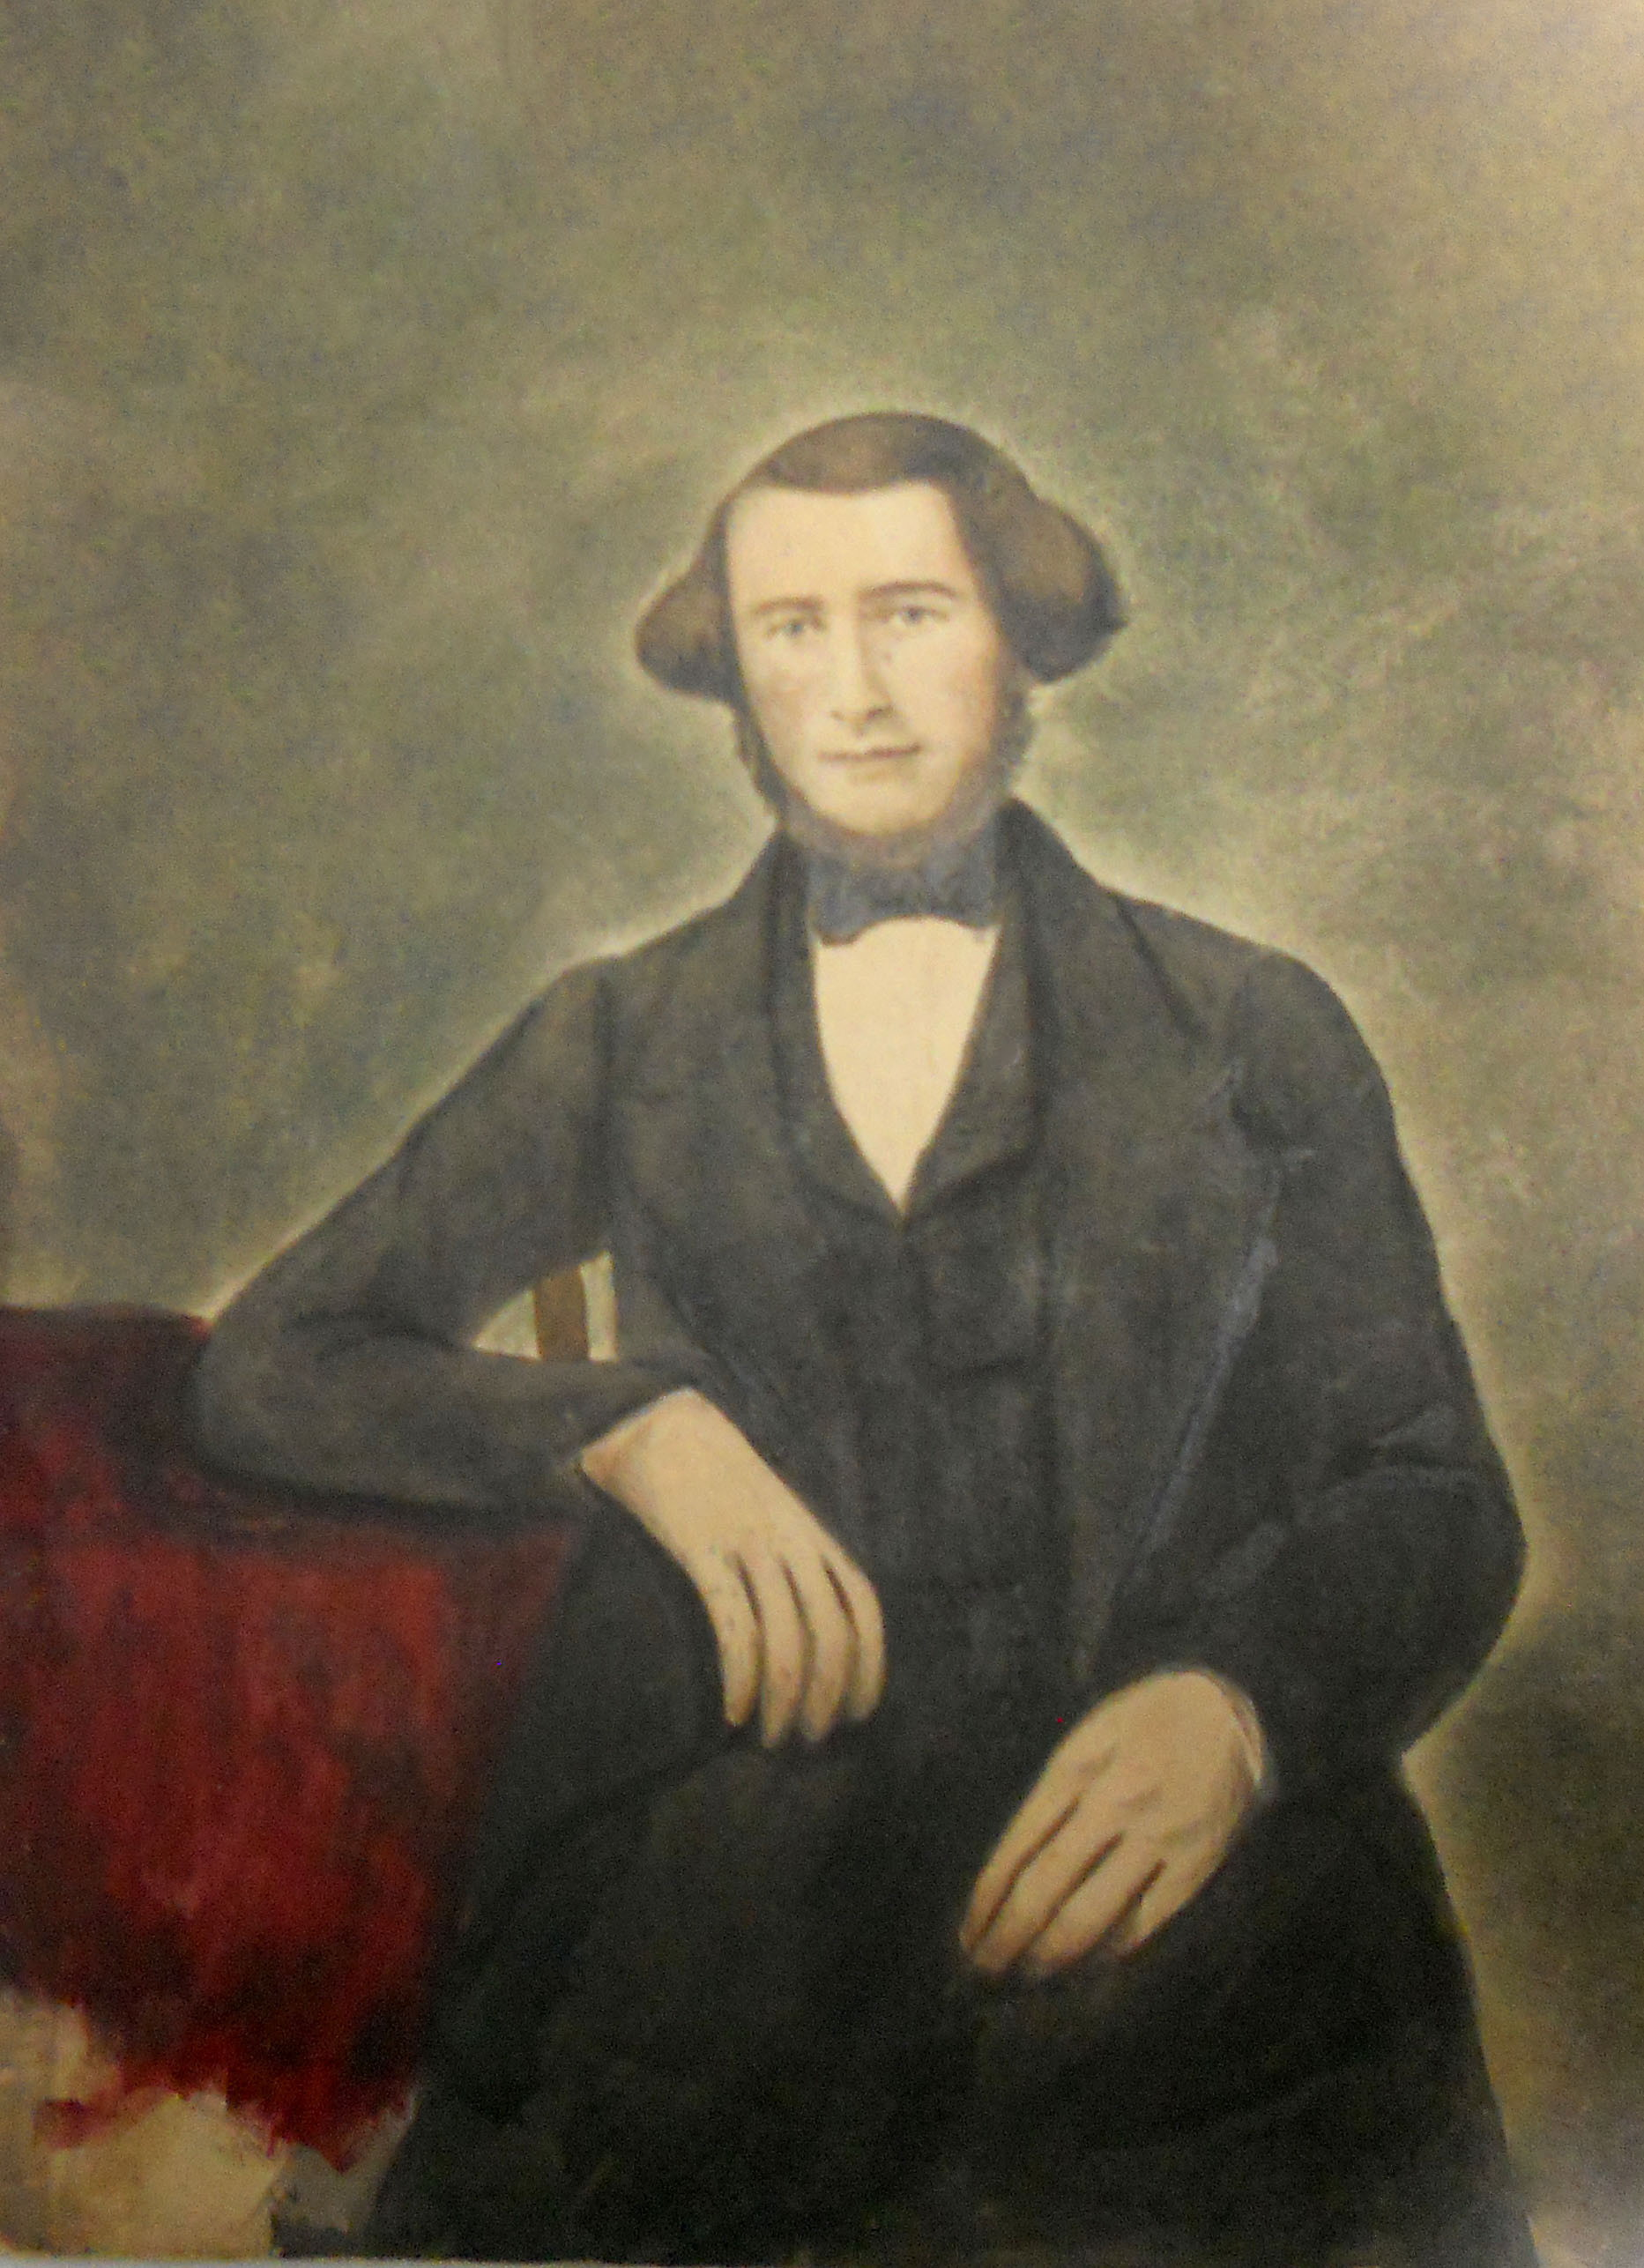 Daniel Pierson